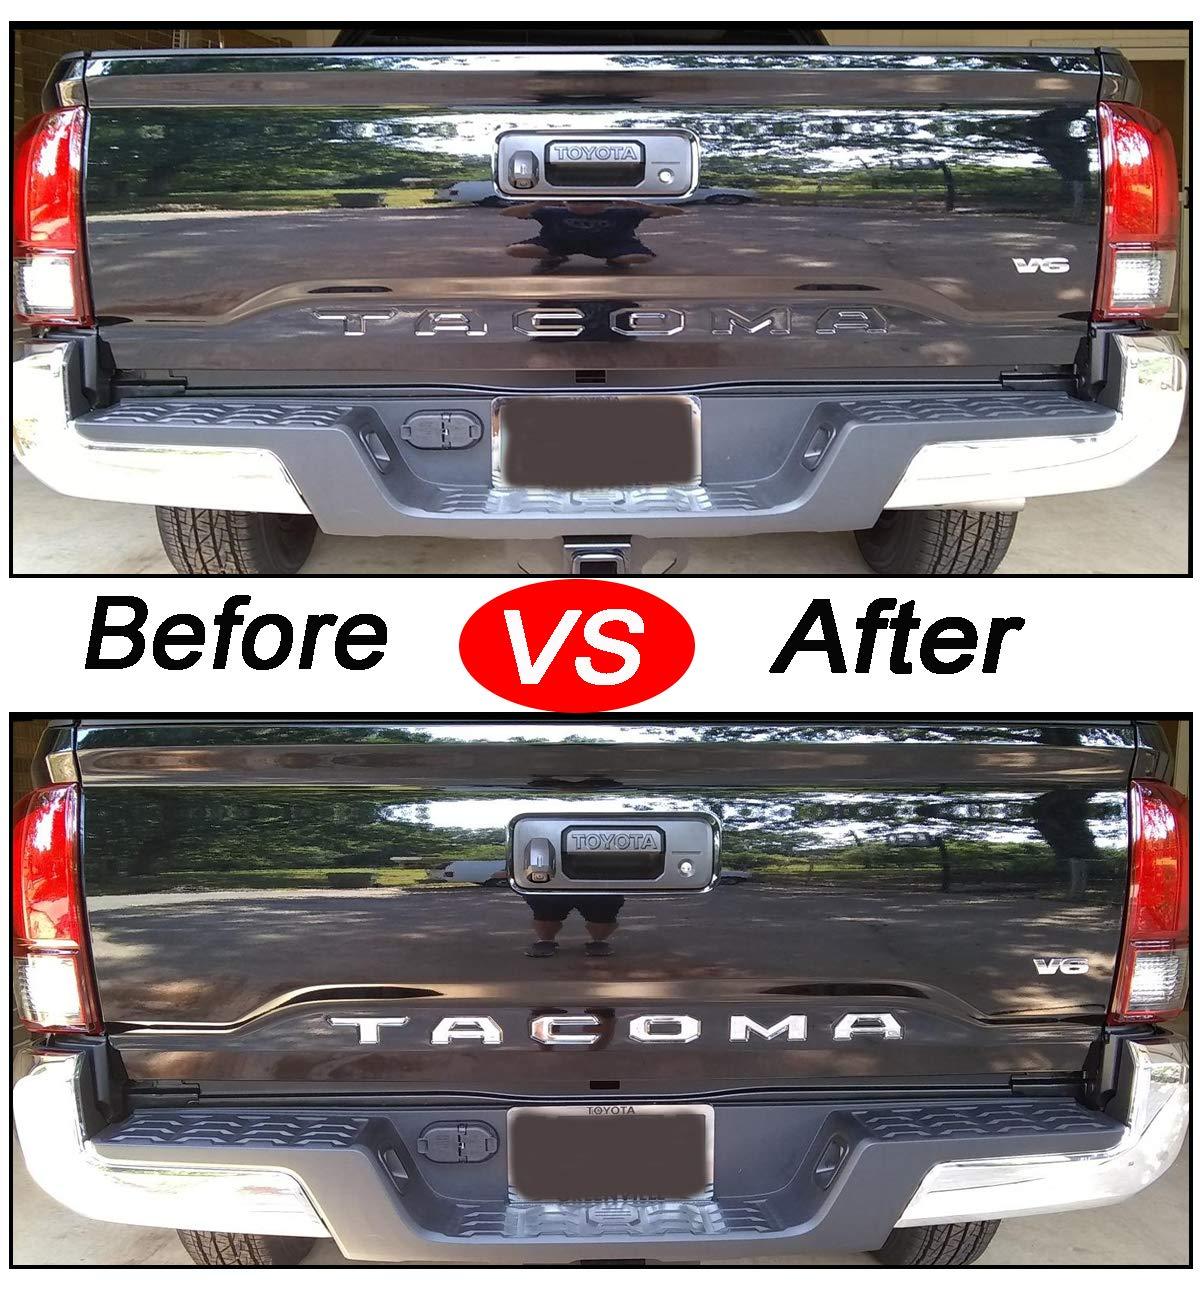 ARITA Tailgate Insert Letters for Toyota Tacoma 2016 2017 2018 2019 2020-3M Adhesive /& 3D Raised Tailgate Letters for Tacoma Chrome Silver